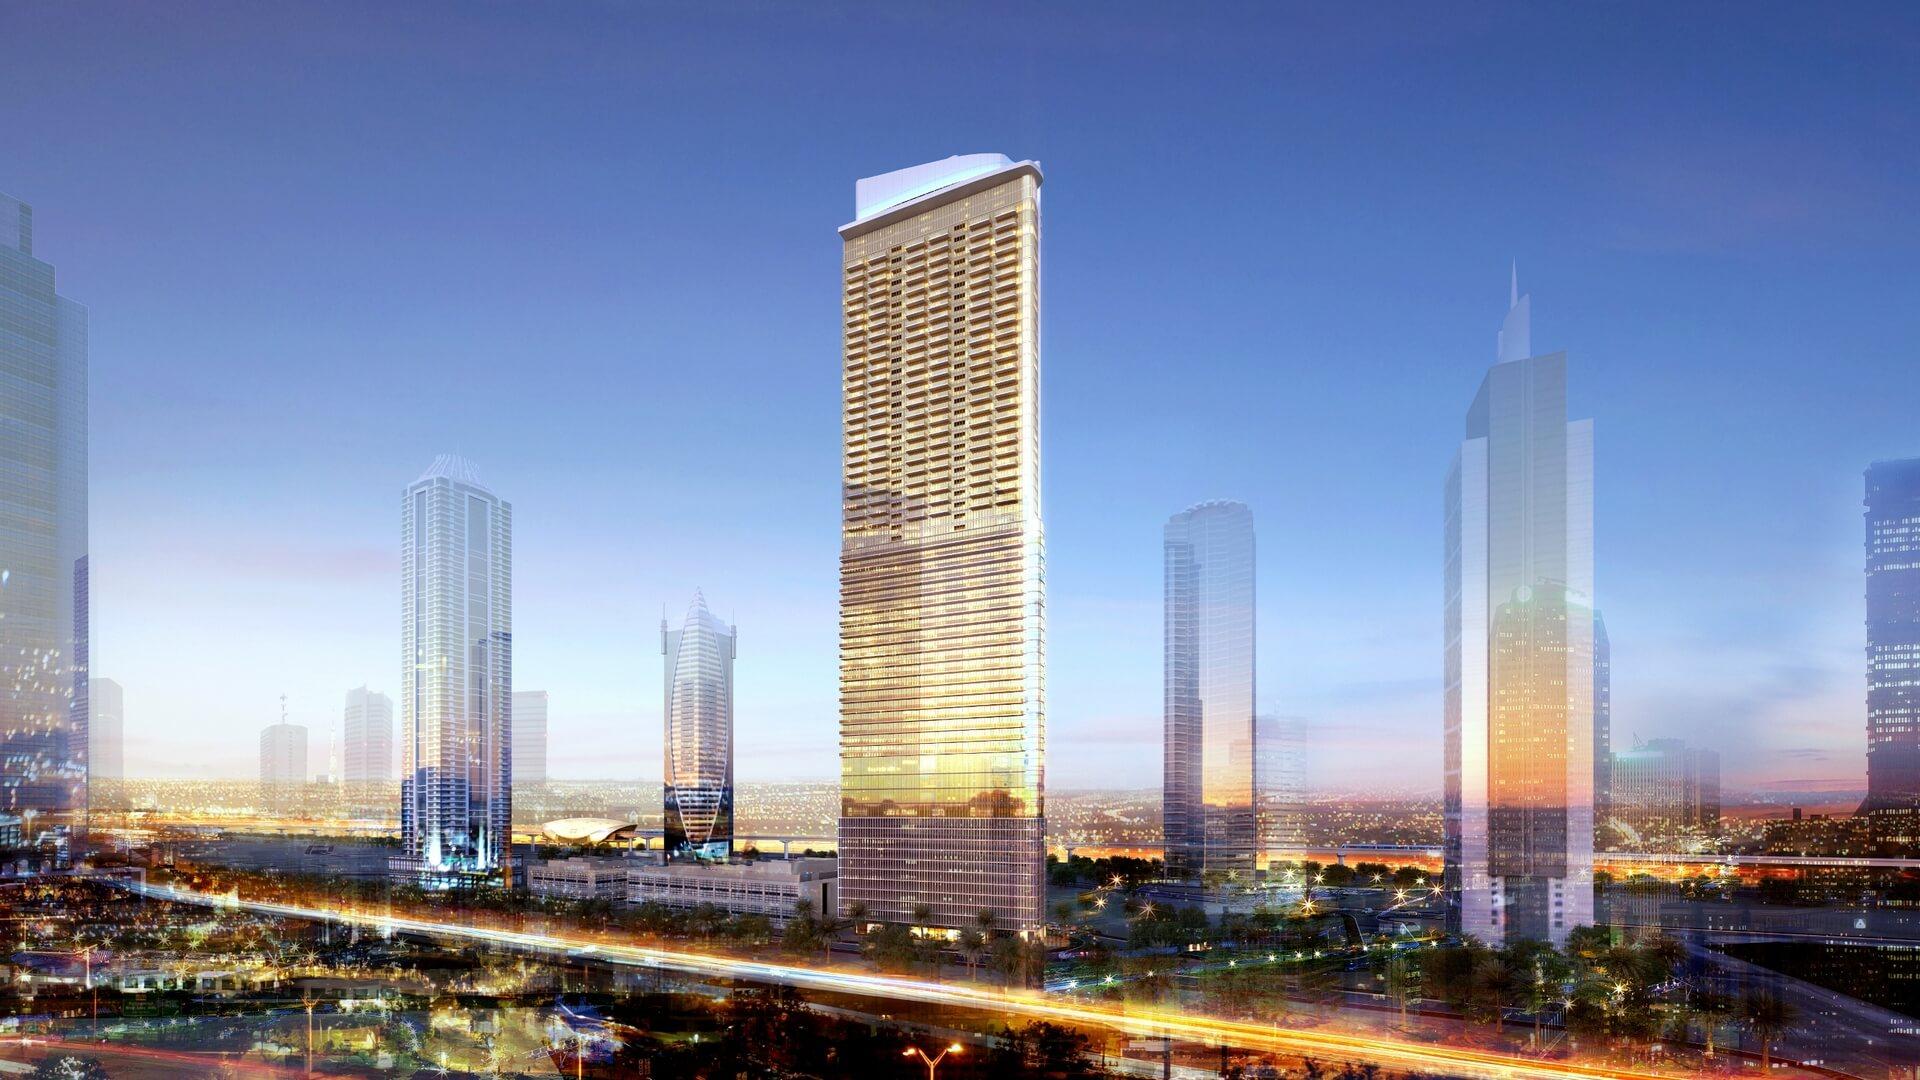 PARAMOUNT TOWER HOTEL & RESIDENCES, Business Bay, Dubai, UAE – photo 1